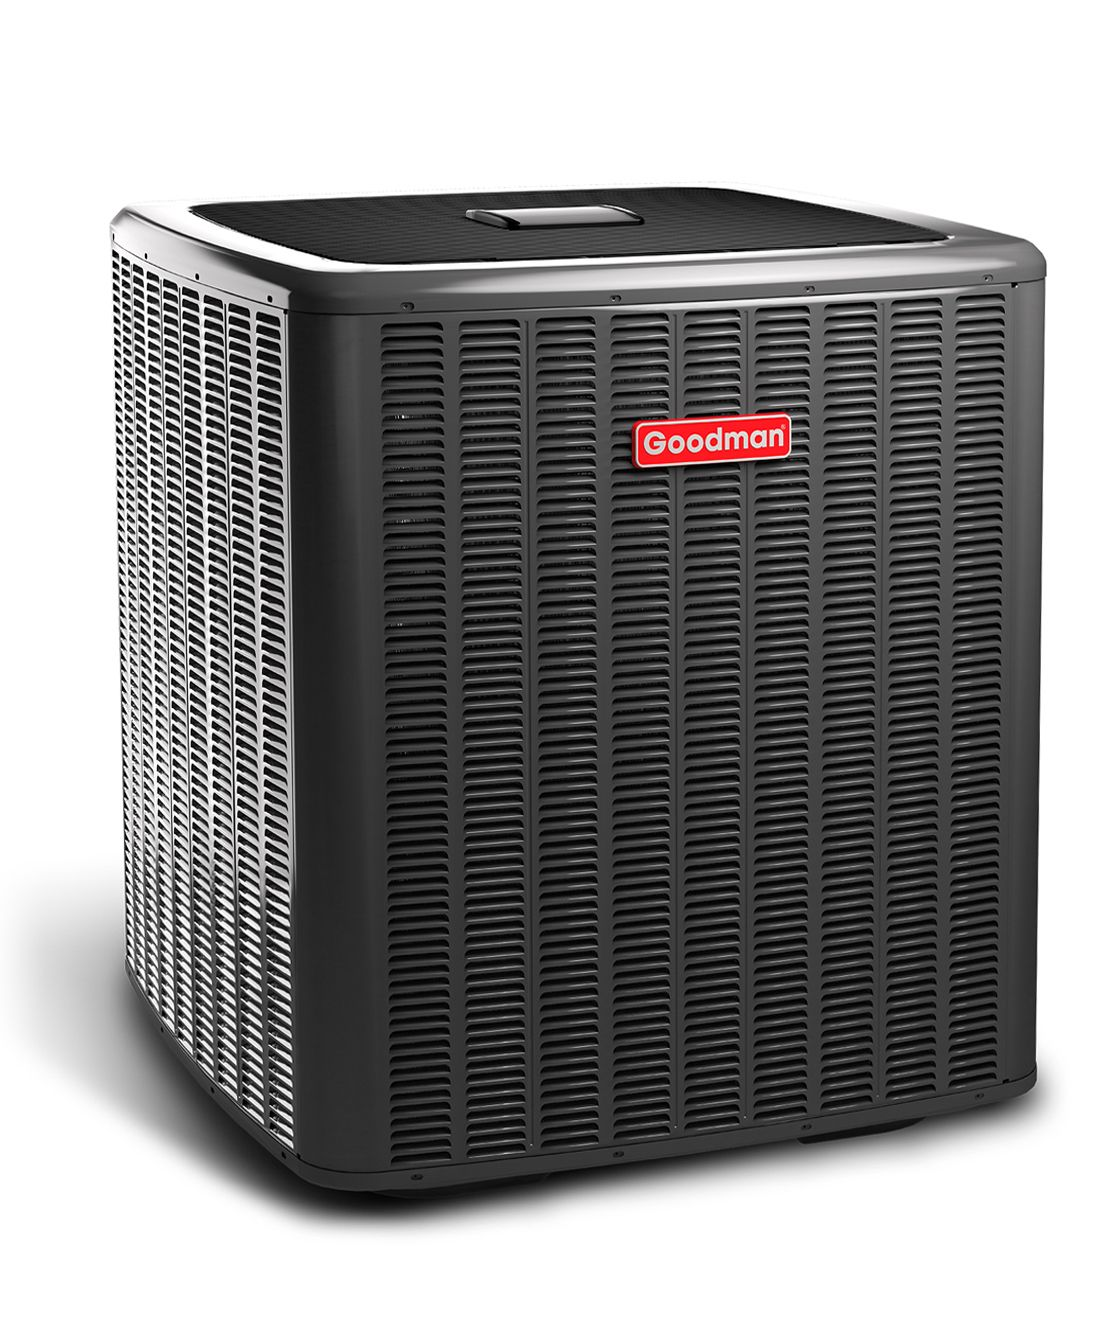 Goodman DSXC18 Air Conditioner High efficiency air